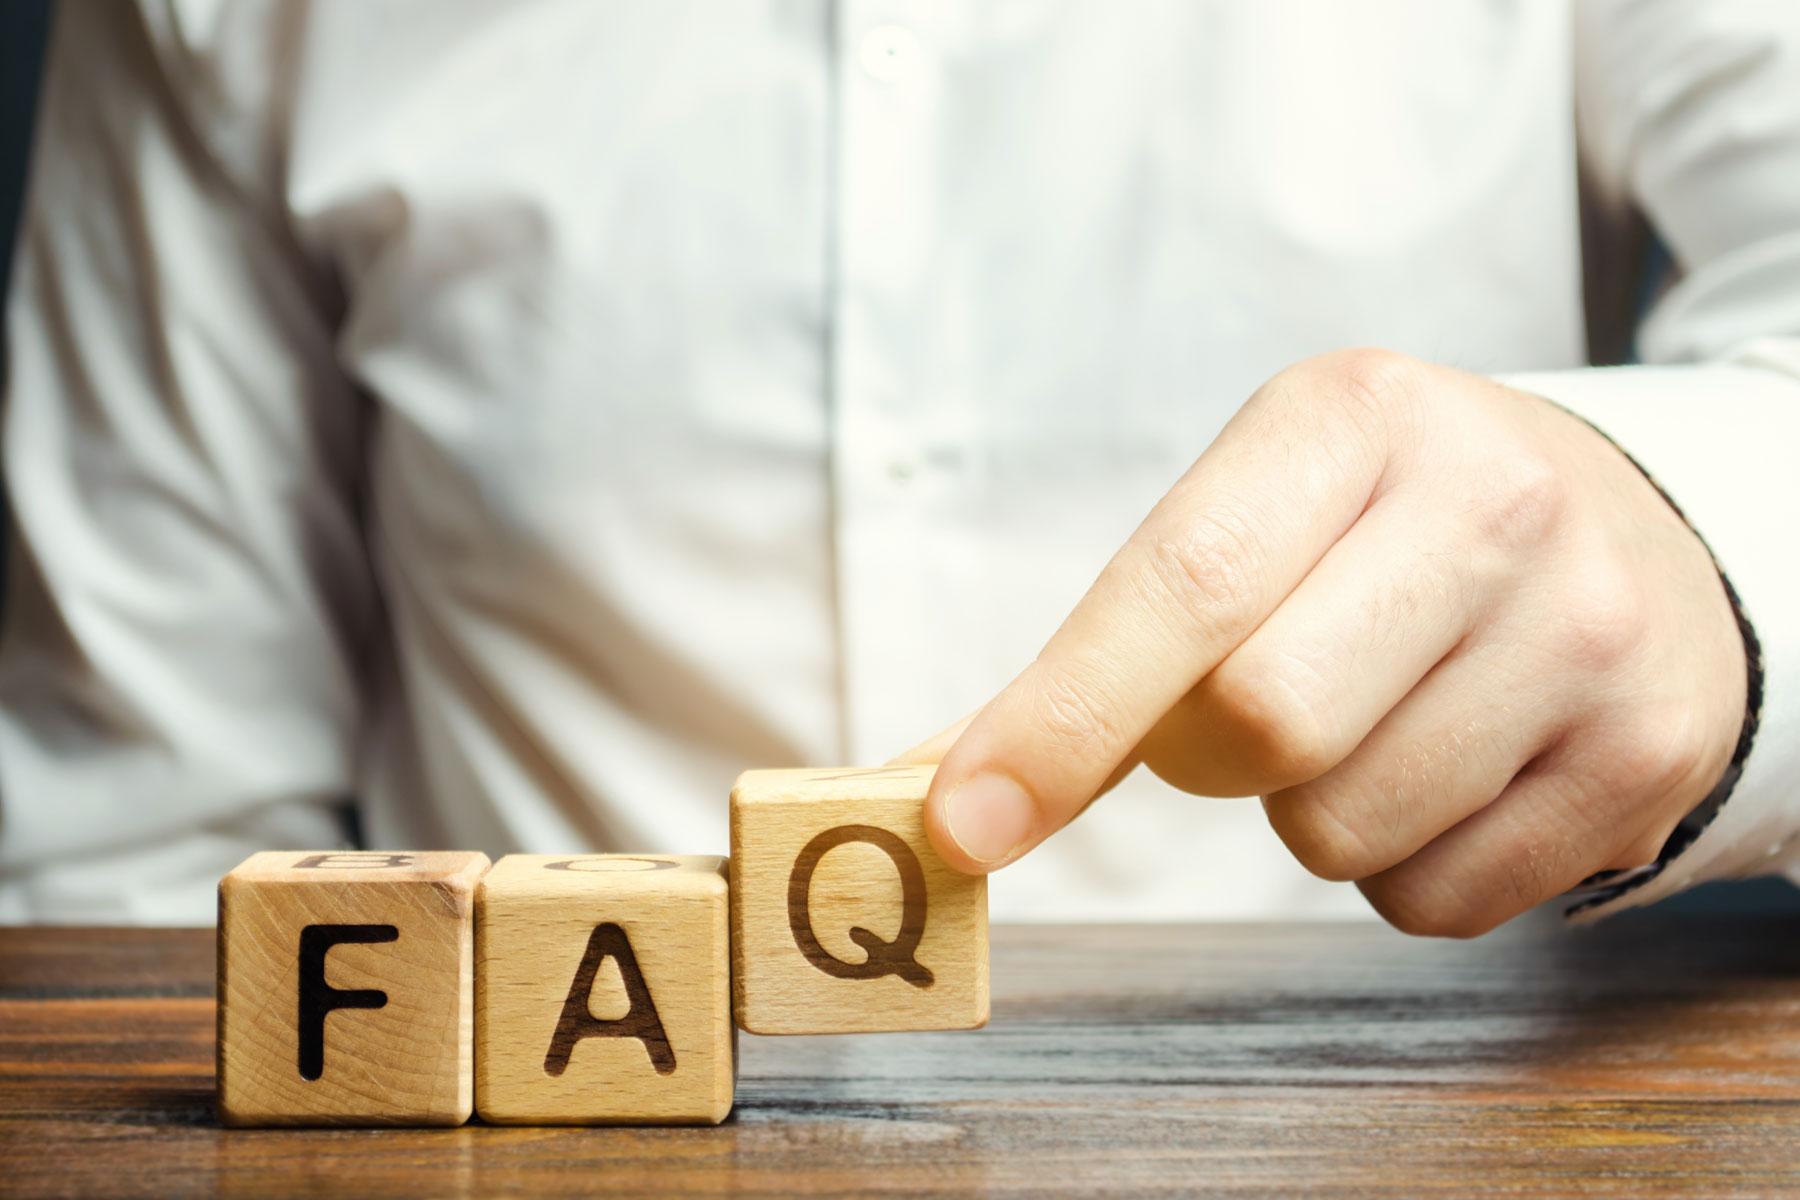 closeup of businessman putting wood blocks together to spell FAQ